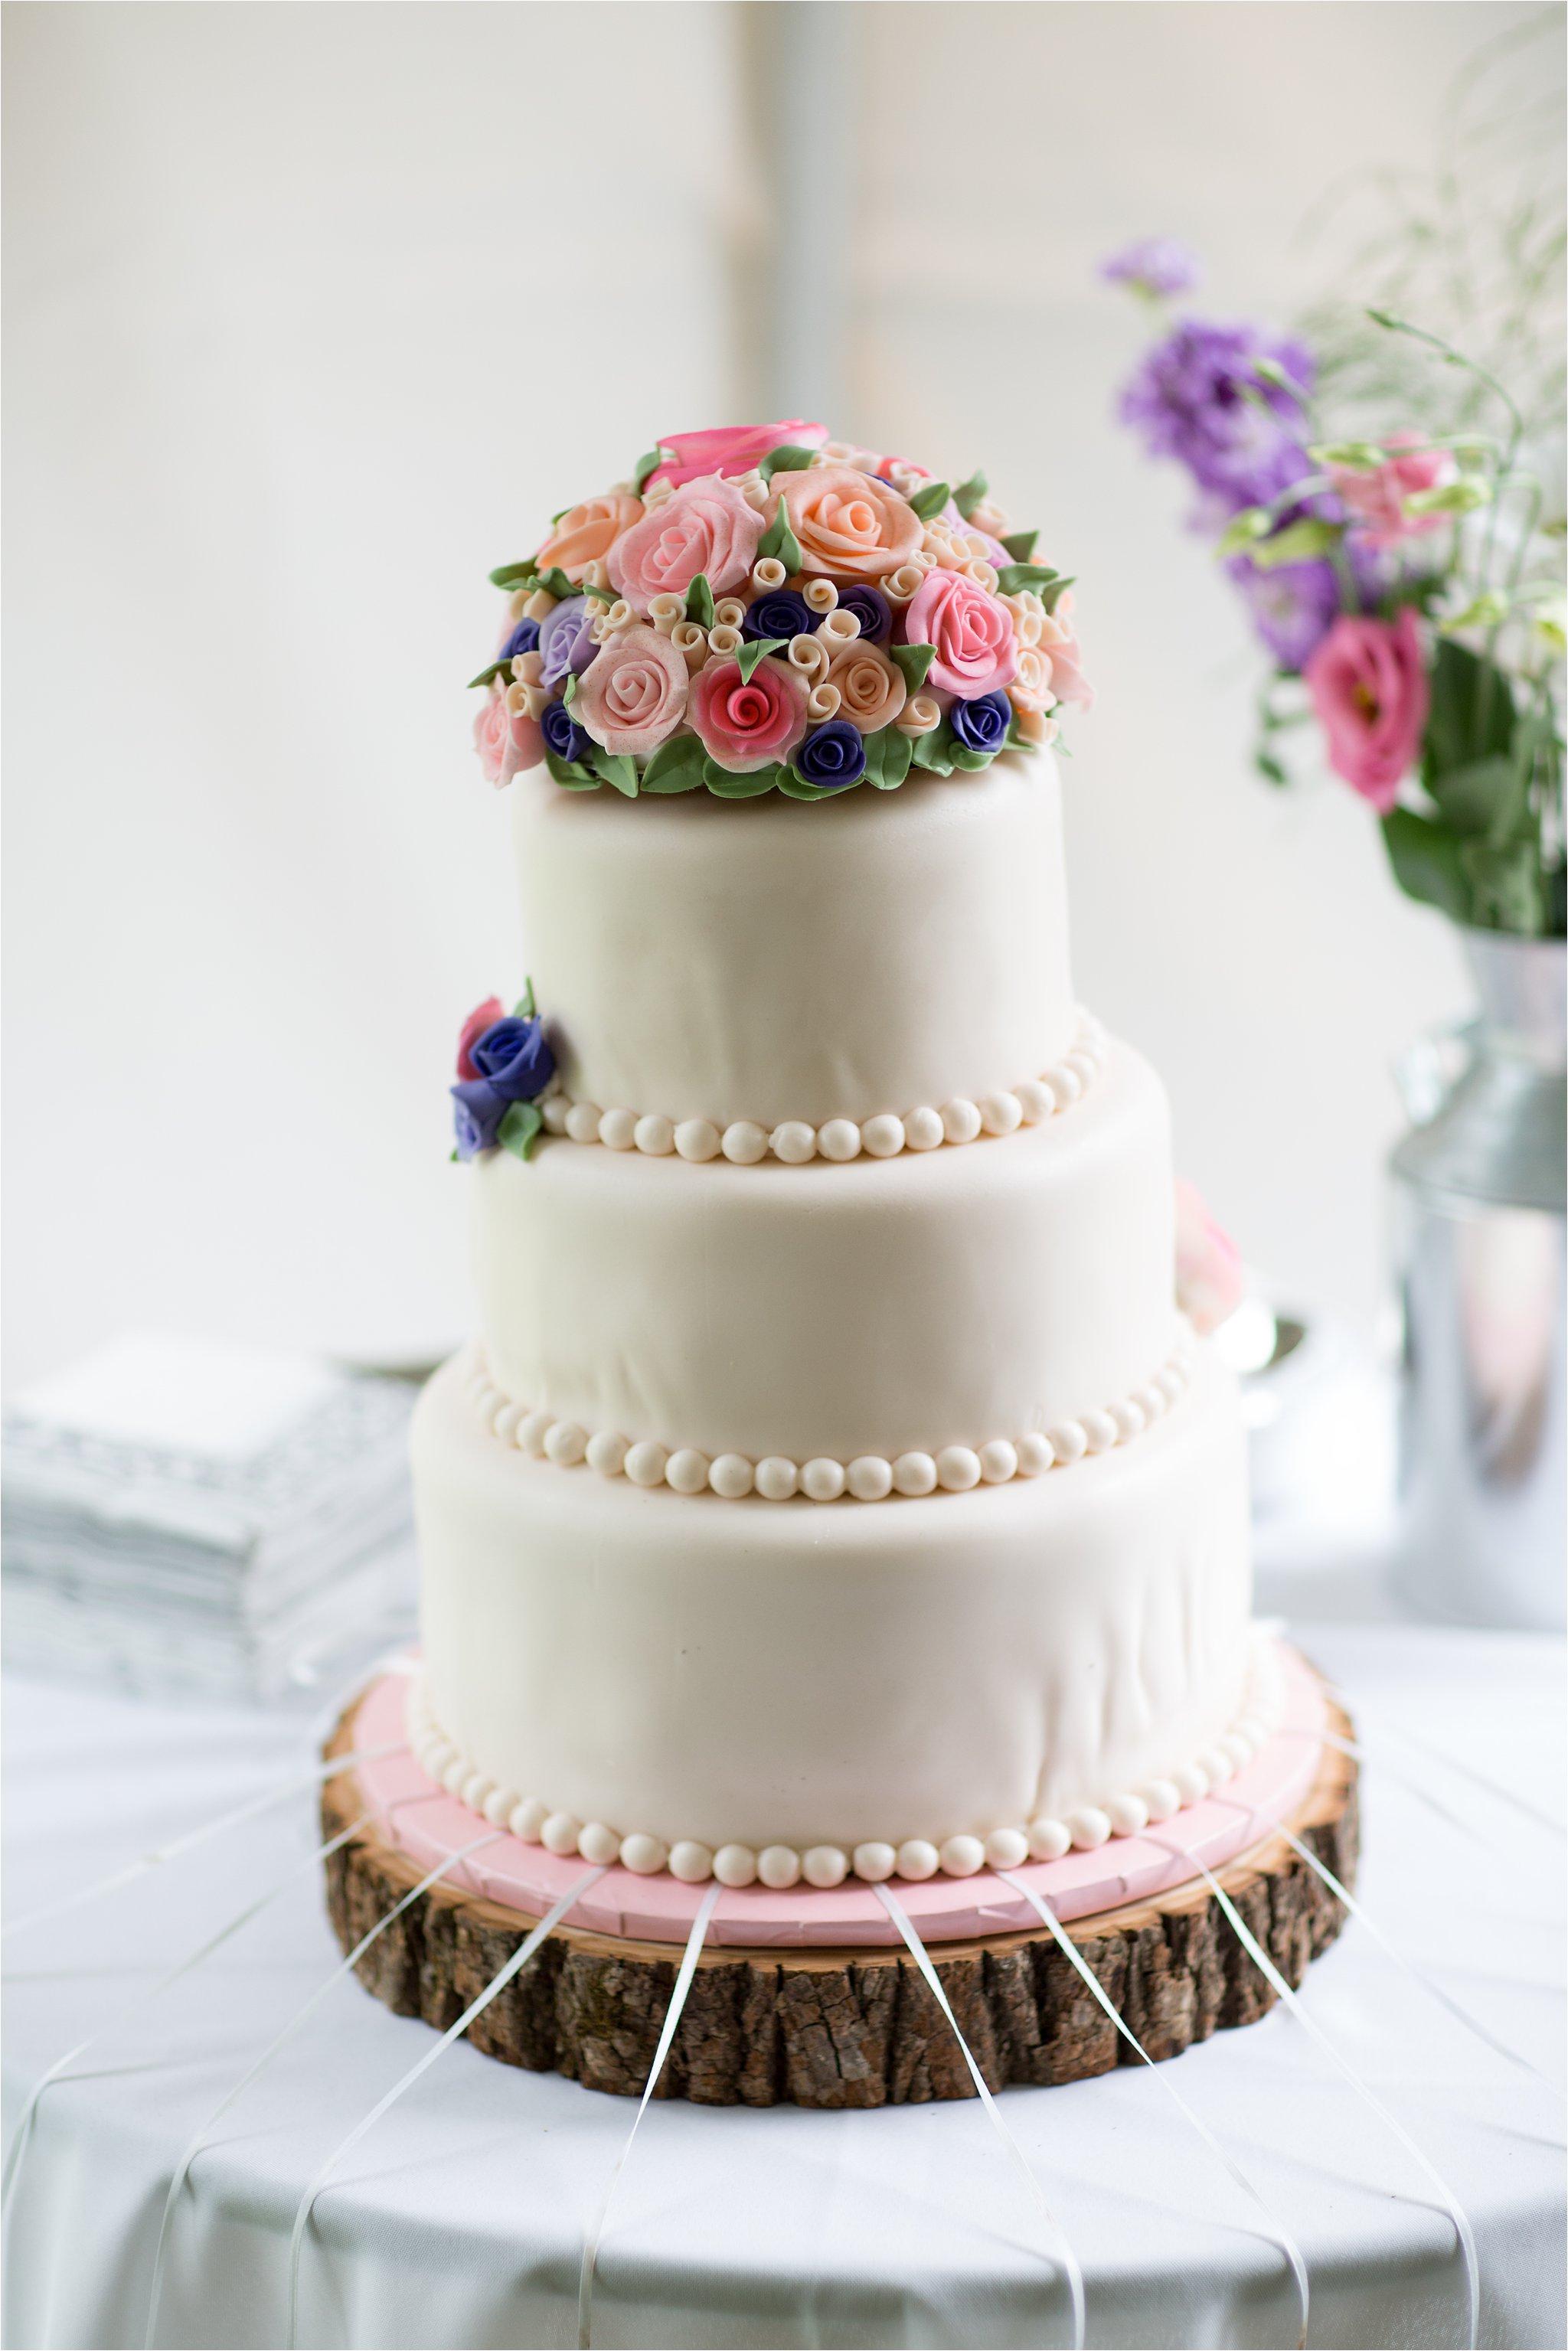 Wedding Cake (C) Maundy Mitchell